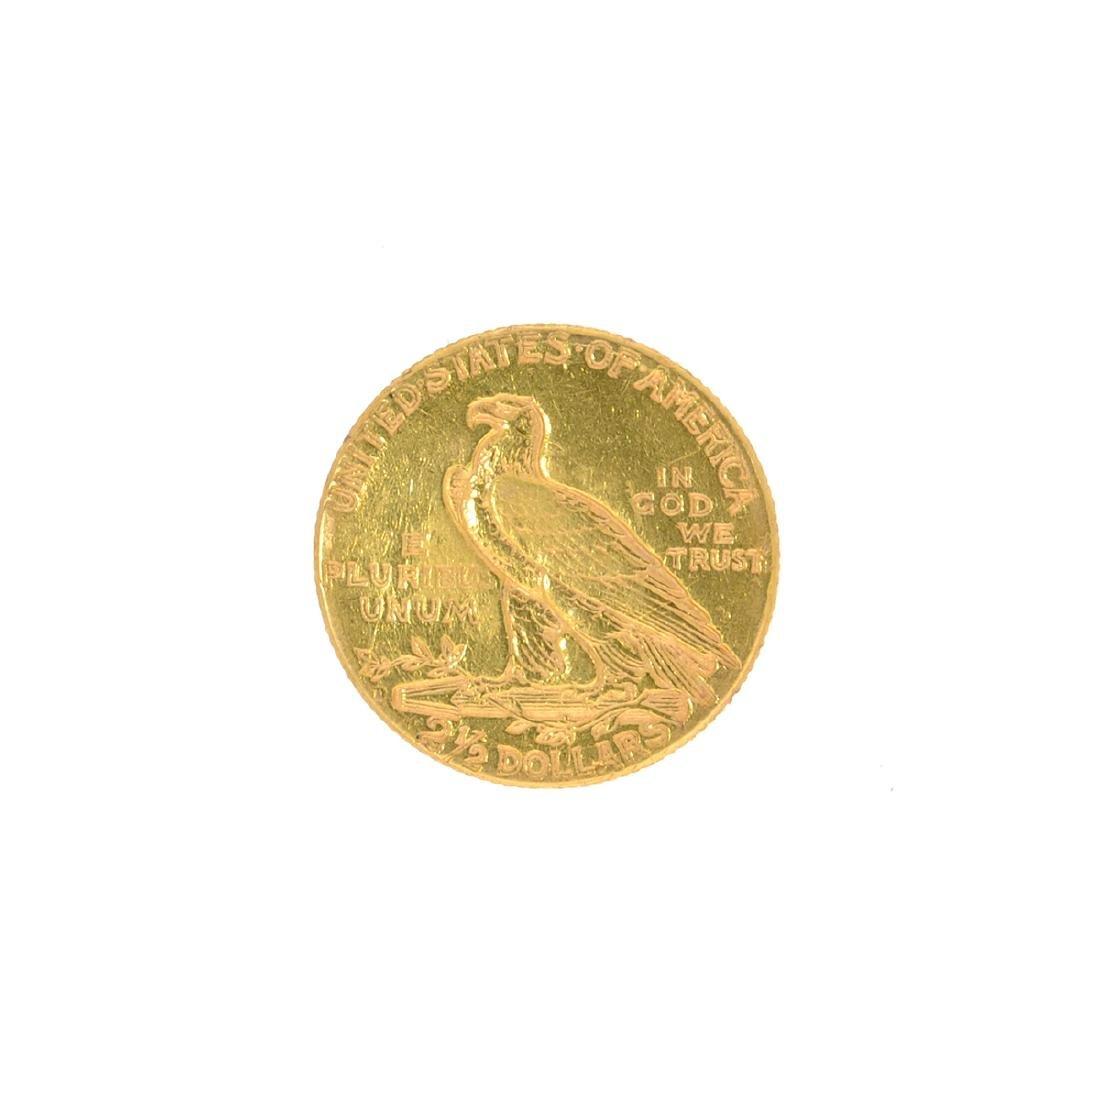 *1925-D $2.50 U.S. Indian Head Gold Coin (JG N) - 2